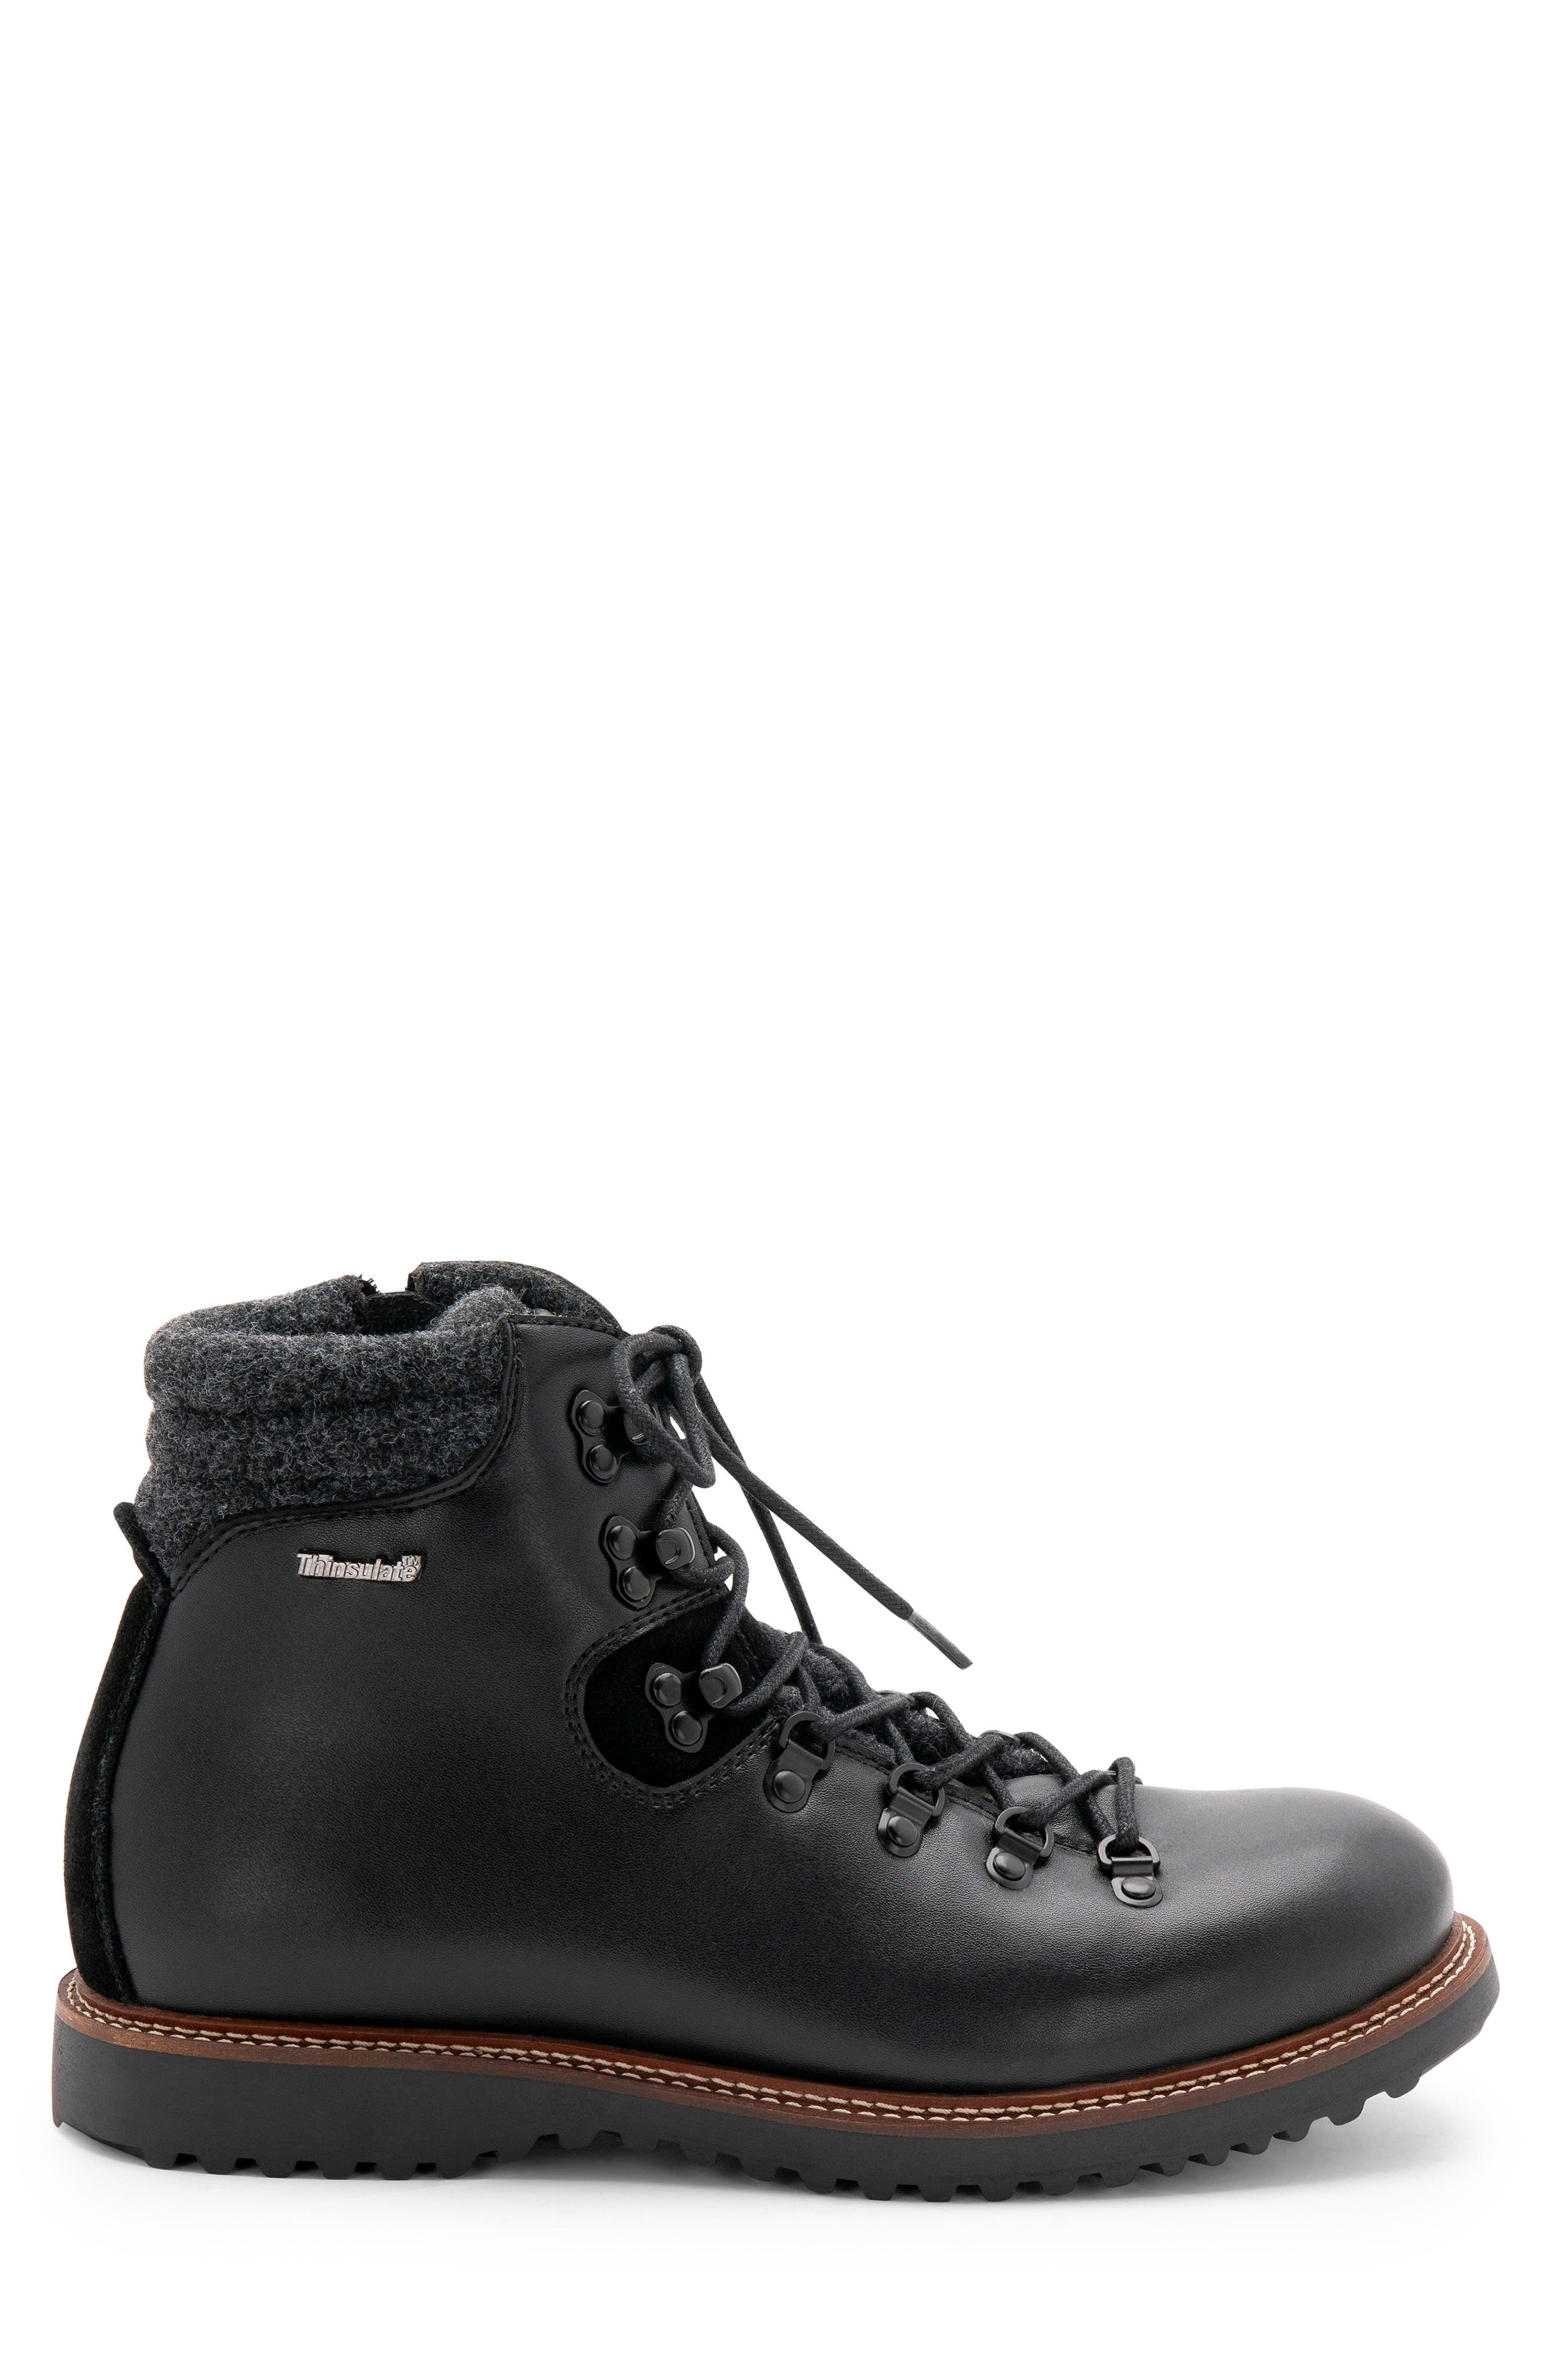 BLONDO, Morgan Waterproof Plain Toe Boot, Alternate thumbnail 3, color, BLACK LEATHER